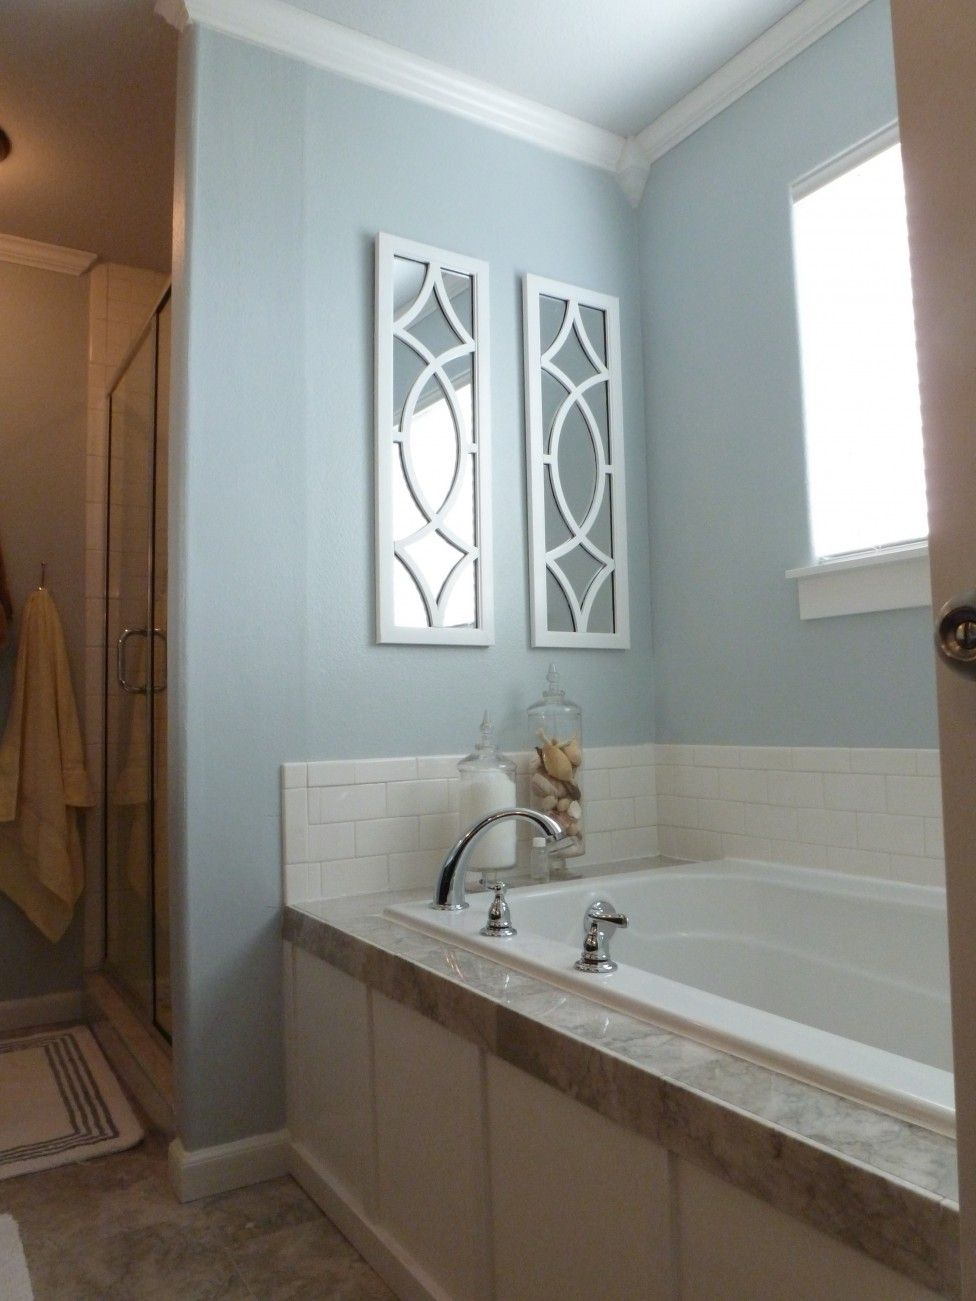 Fascinating Bathroom Colors Small Bathroom Wall Colors Best Modern Furniture Design Bathroom Col Small Bathroom Colors Bathroom Wall Colors Blue Bathroom Paint